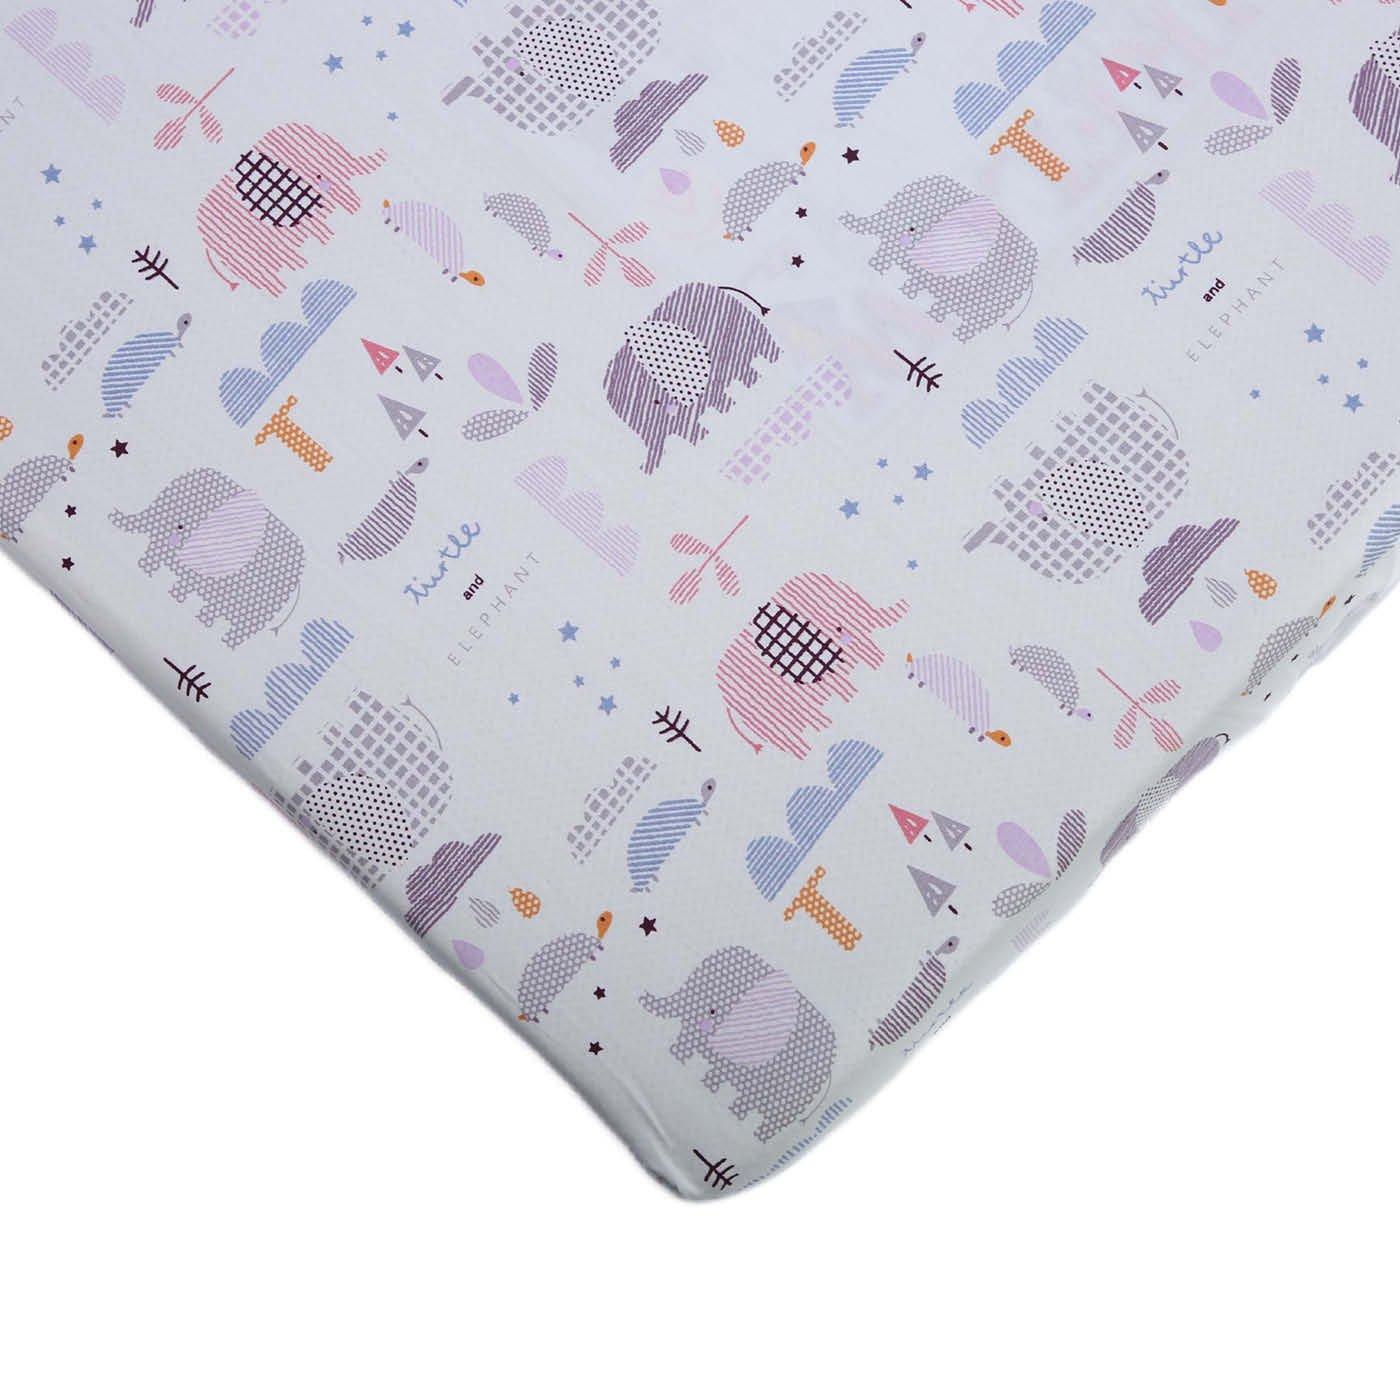 Cot sheet - Pink elephant